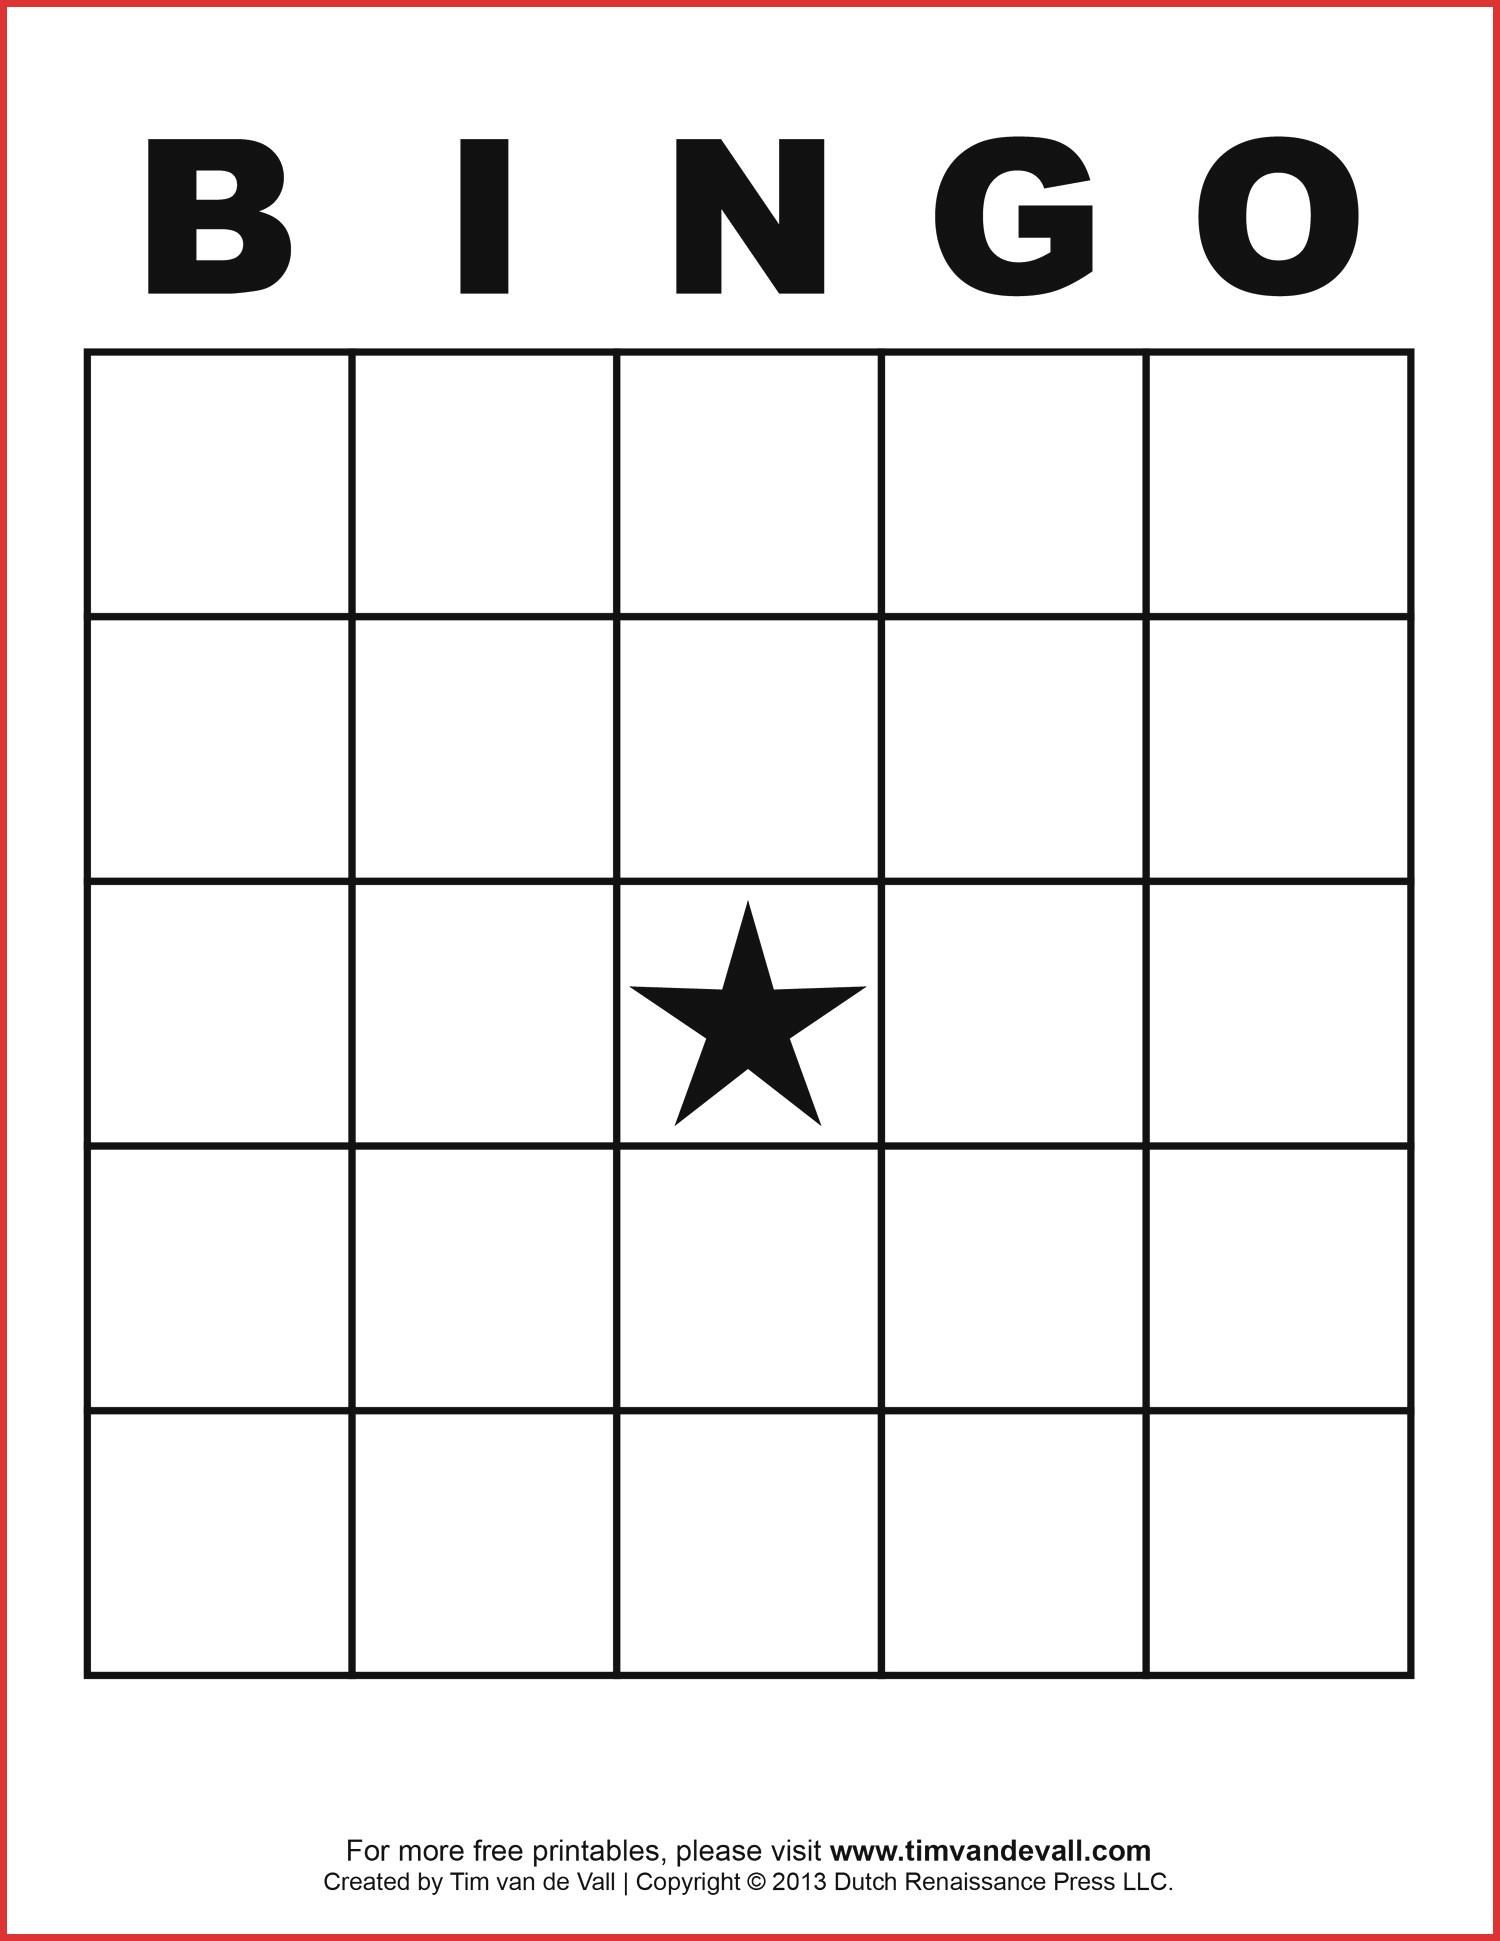 Awesome Blank Bingo Template | Dos Joinery - Printable Bingo Template Free